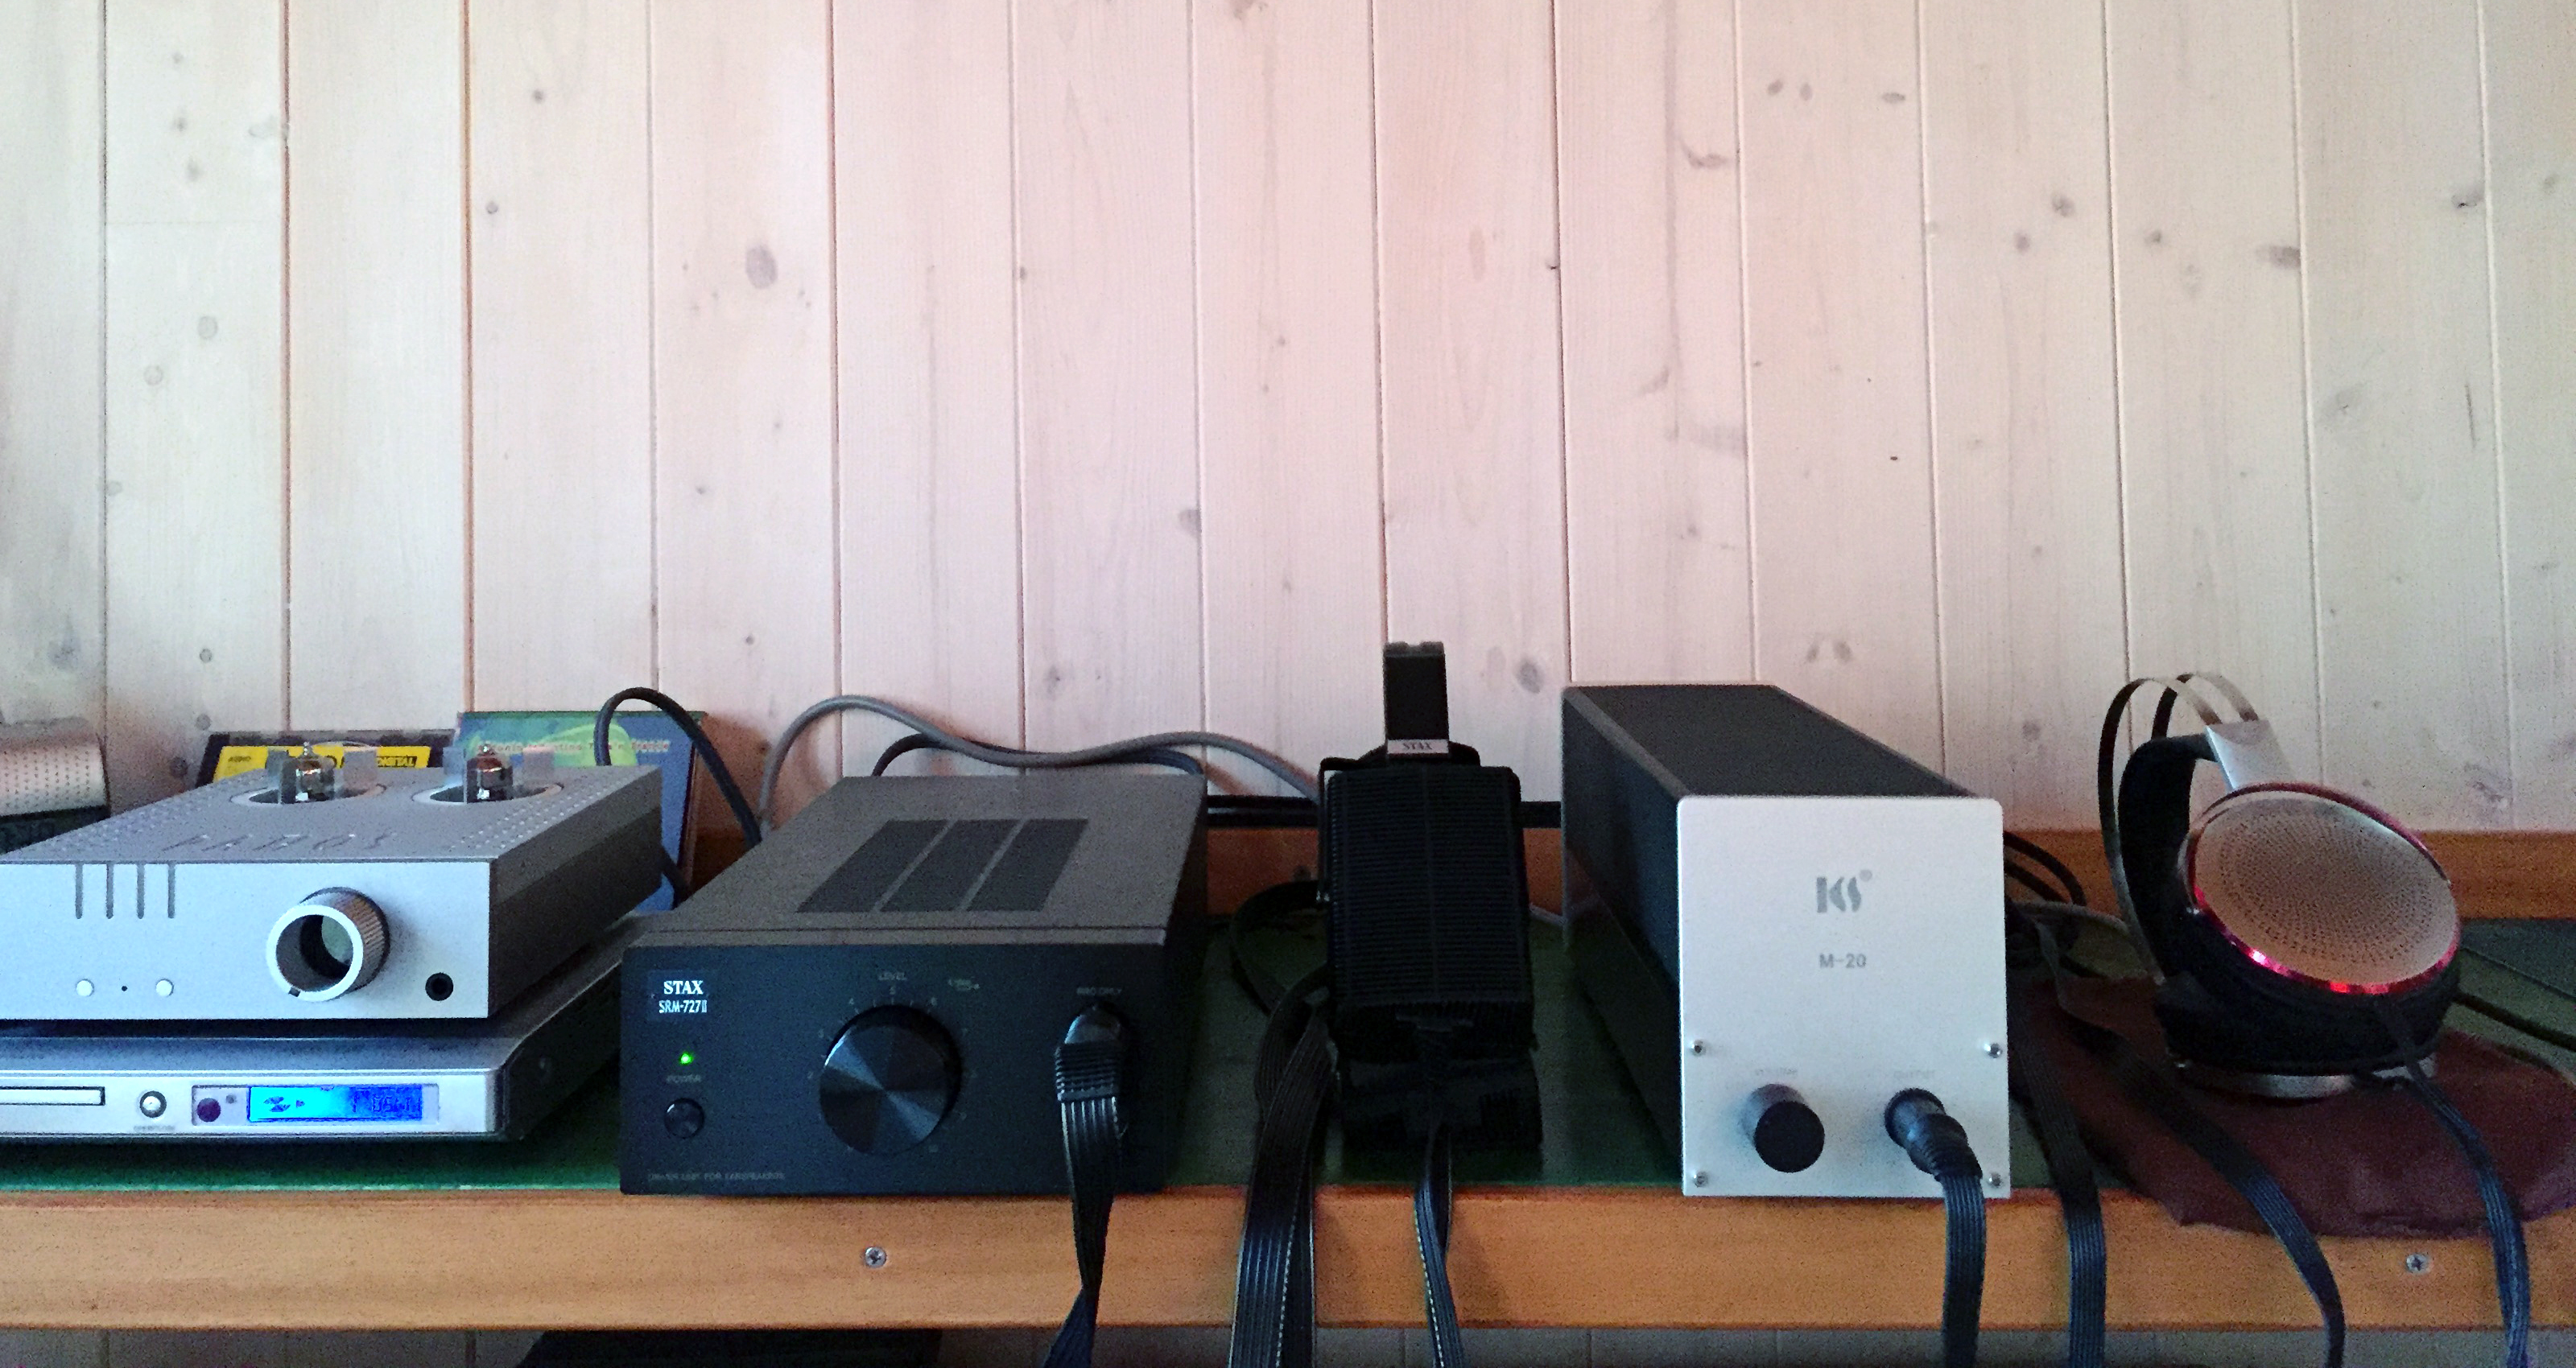 Pathos Aurium + Stax SRM-727I + SR-507 - KingSound M-20 + KS-H3